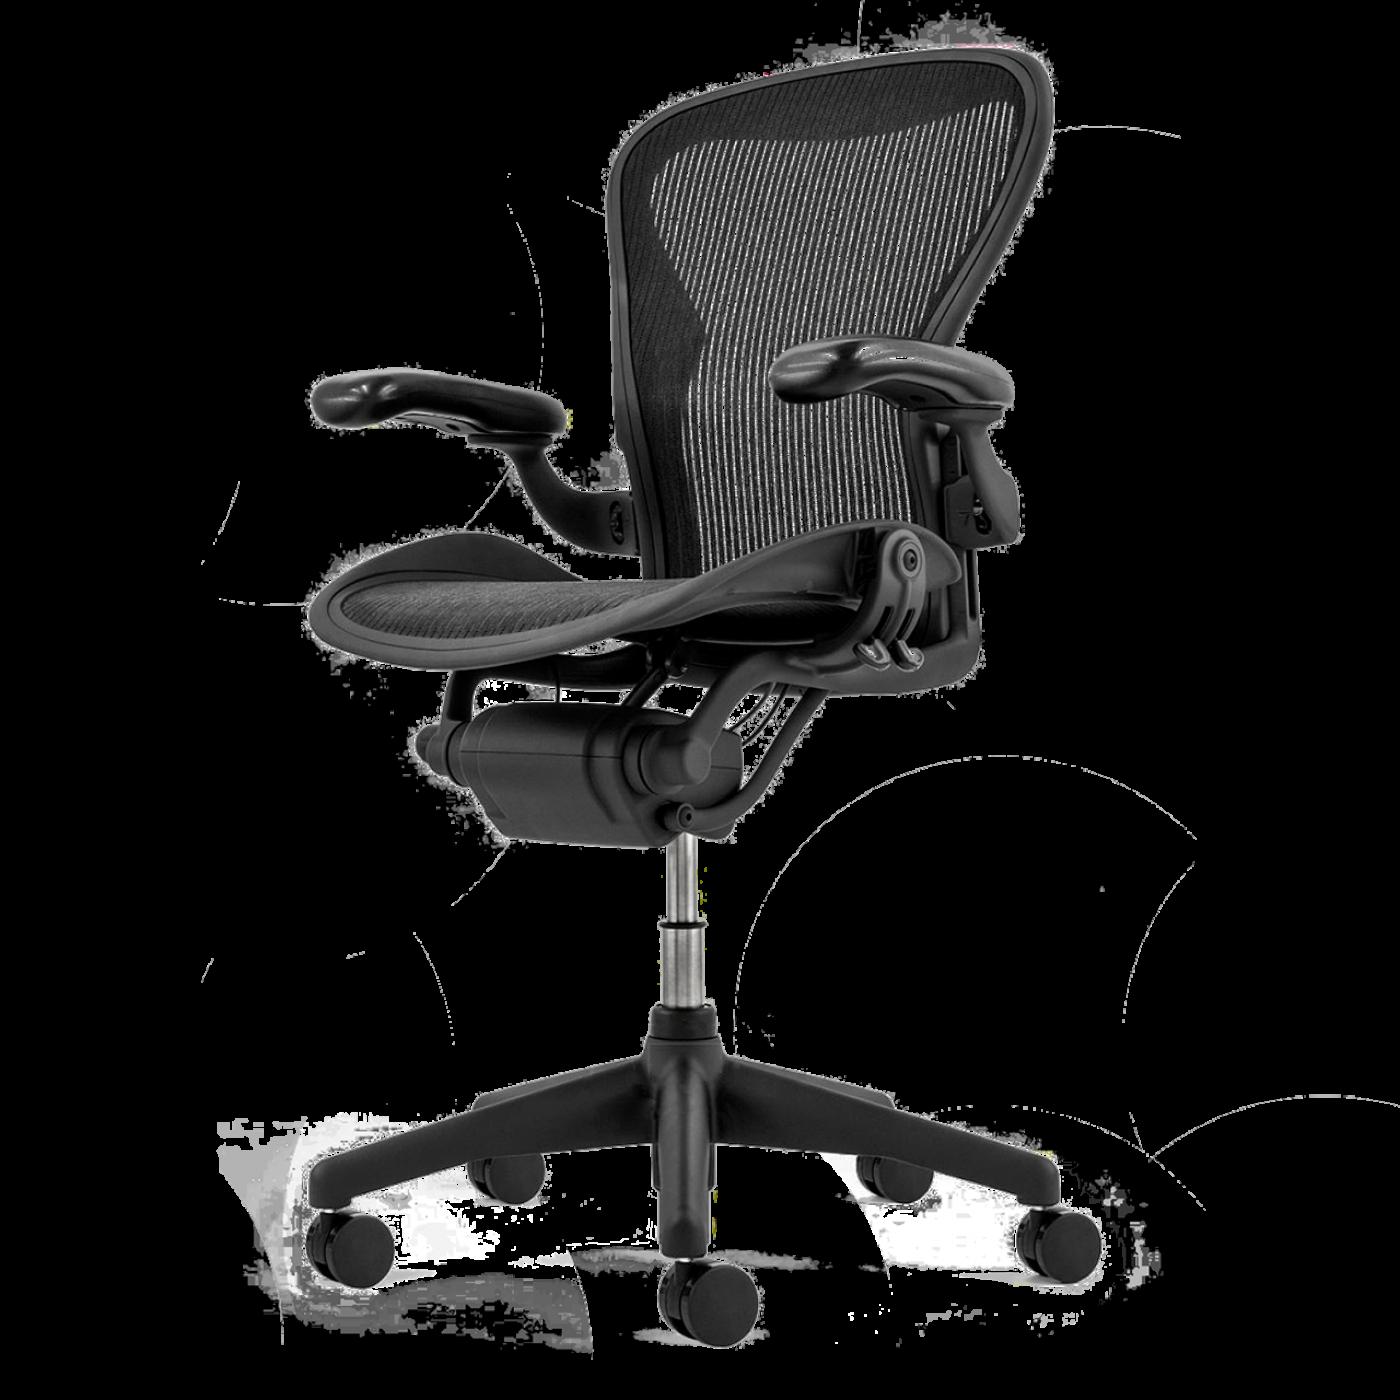 https://www.valueshop.dk/media/catalog/product/7/4/7485.herman-miller-aeron-chair_1.jpg